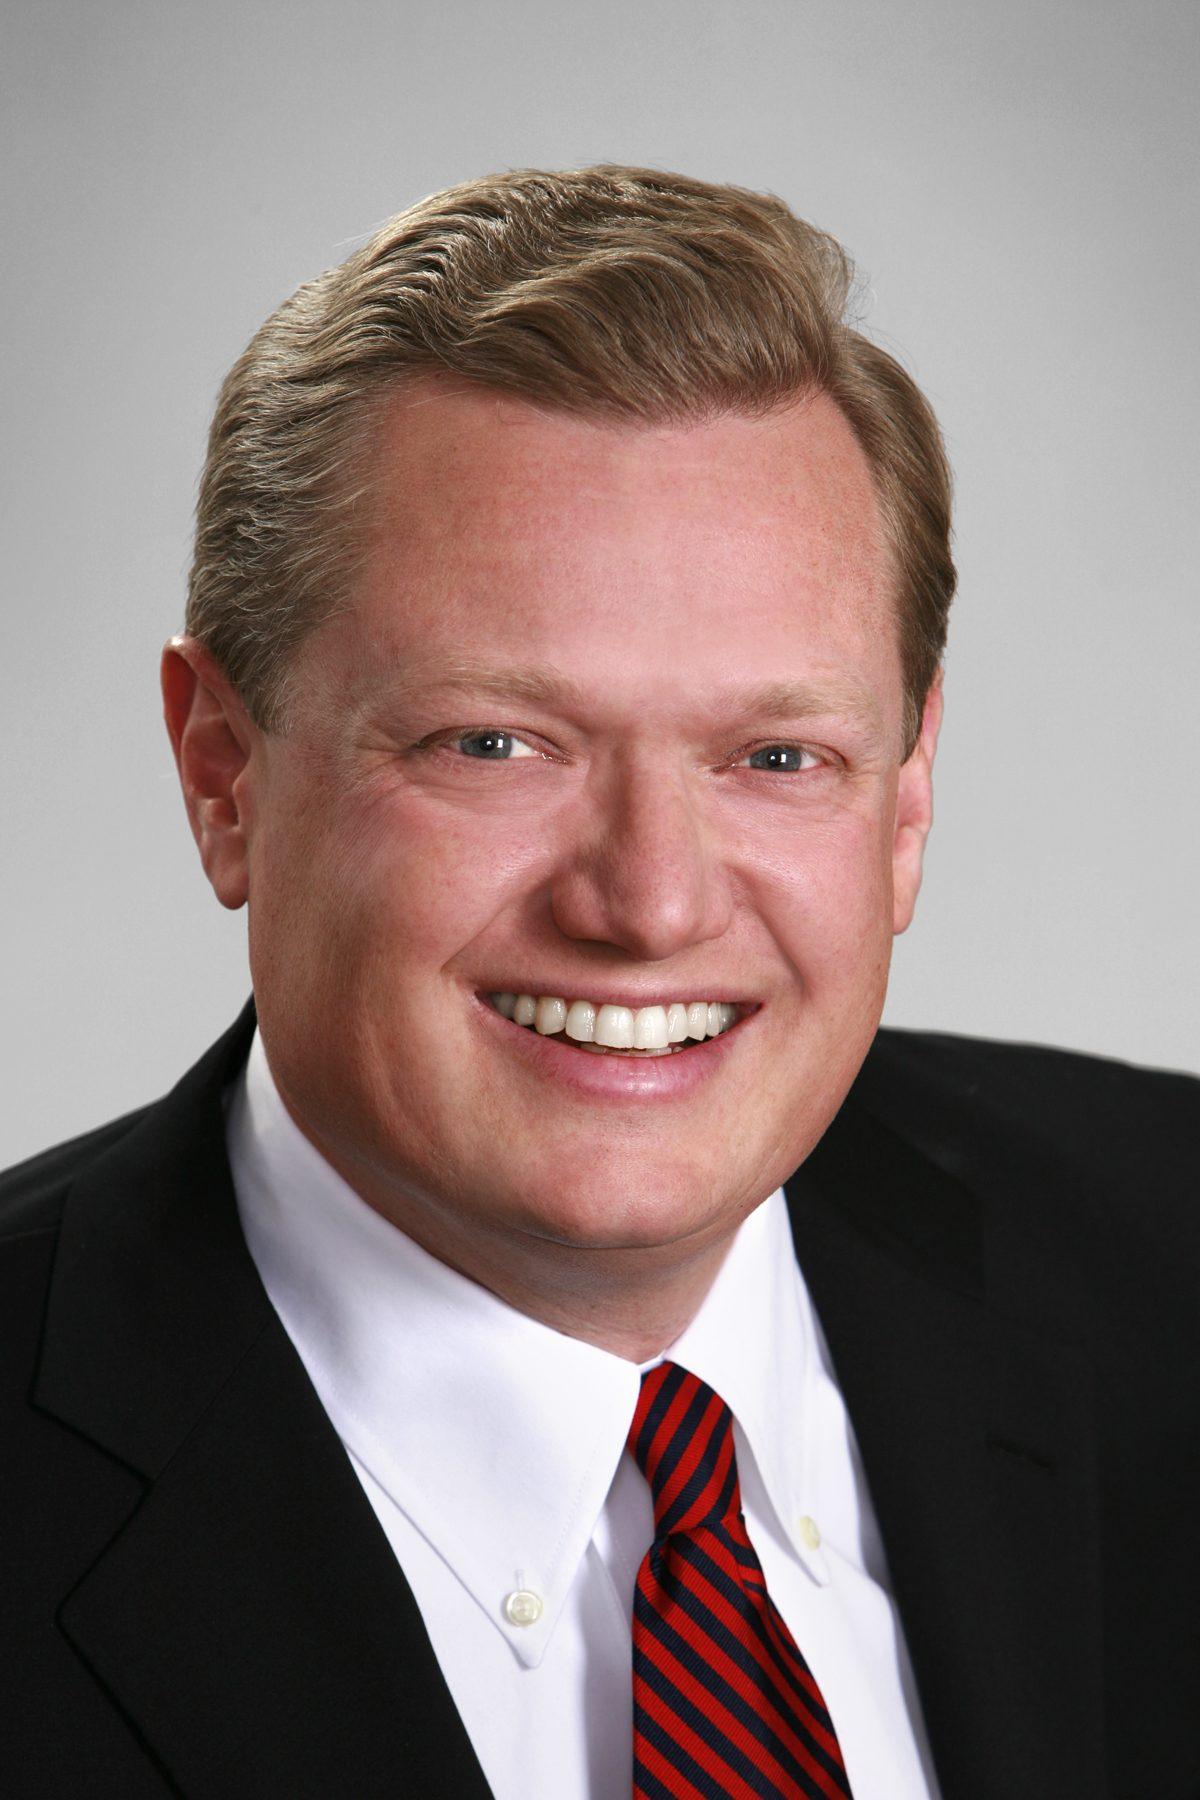 Chris Doggett, Kaspersky Lab SVP of Corporate Sales in North America